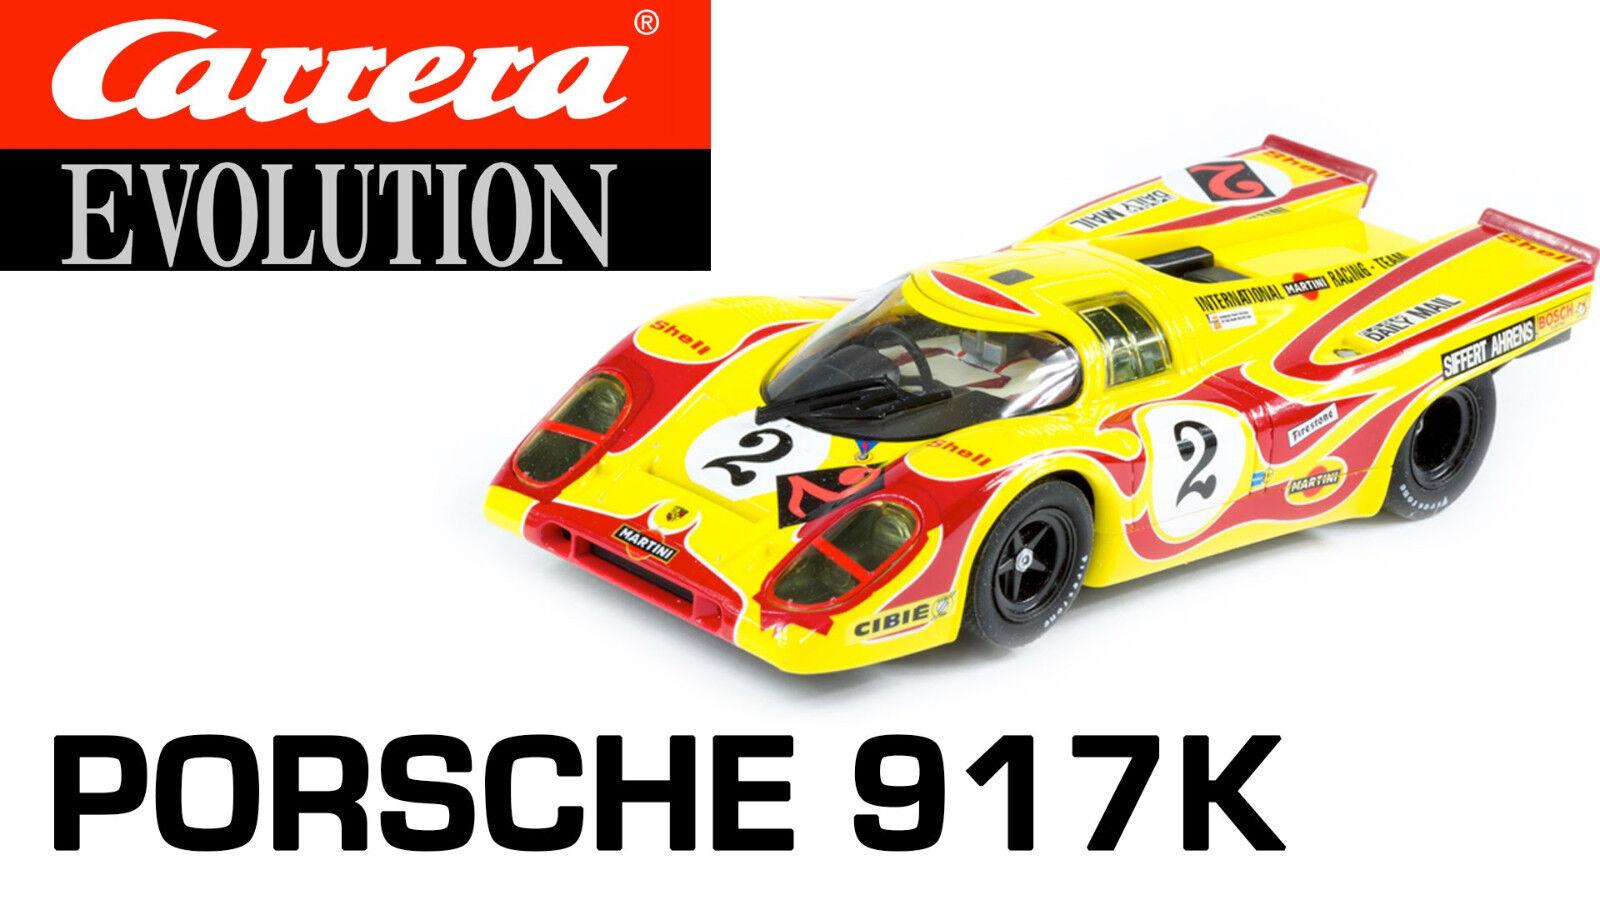 Carrera 1 32 ref. 27498 PORSCHE 917K NEW NEW